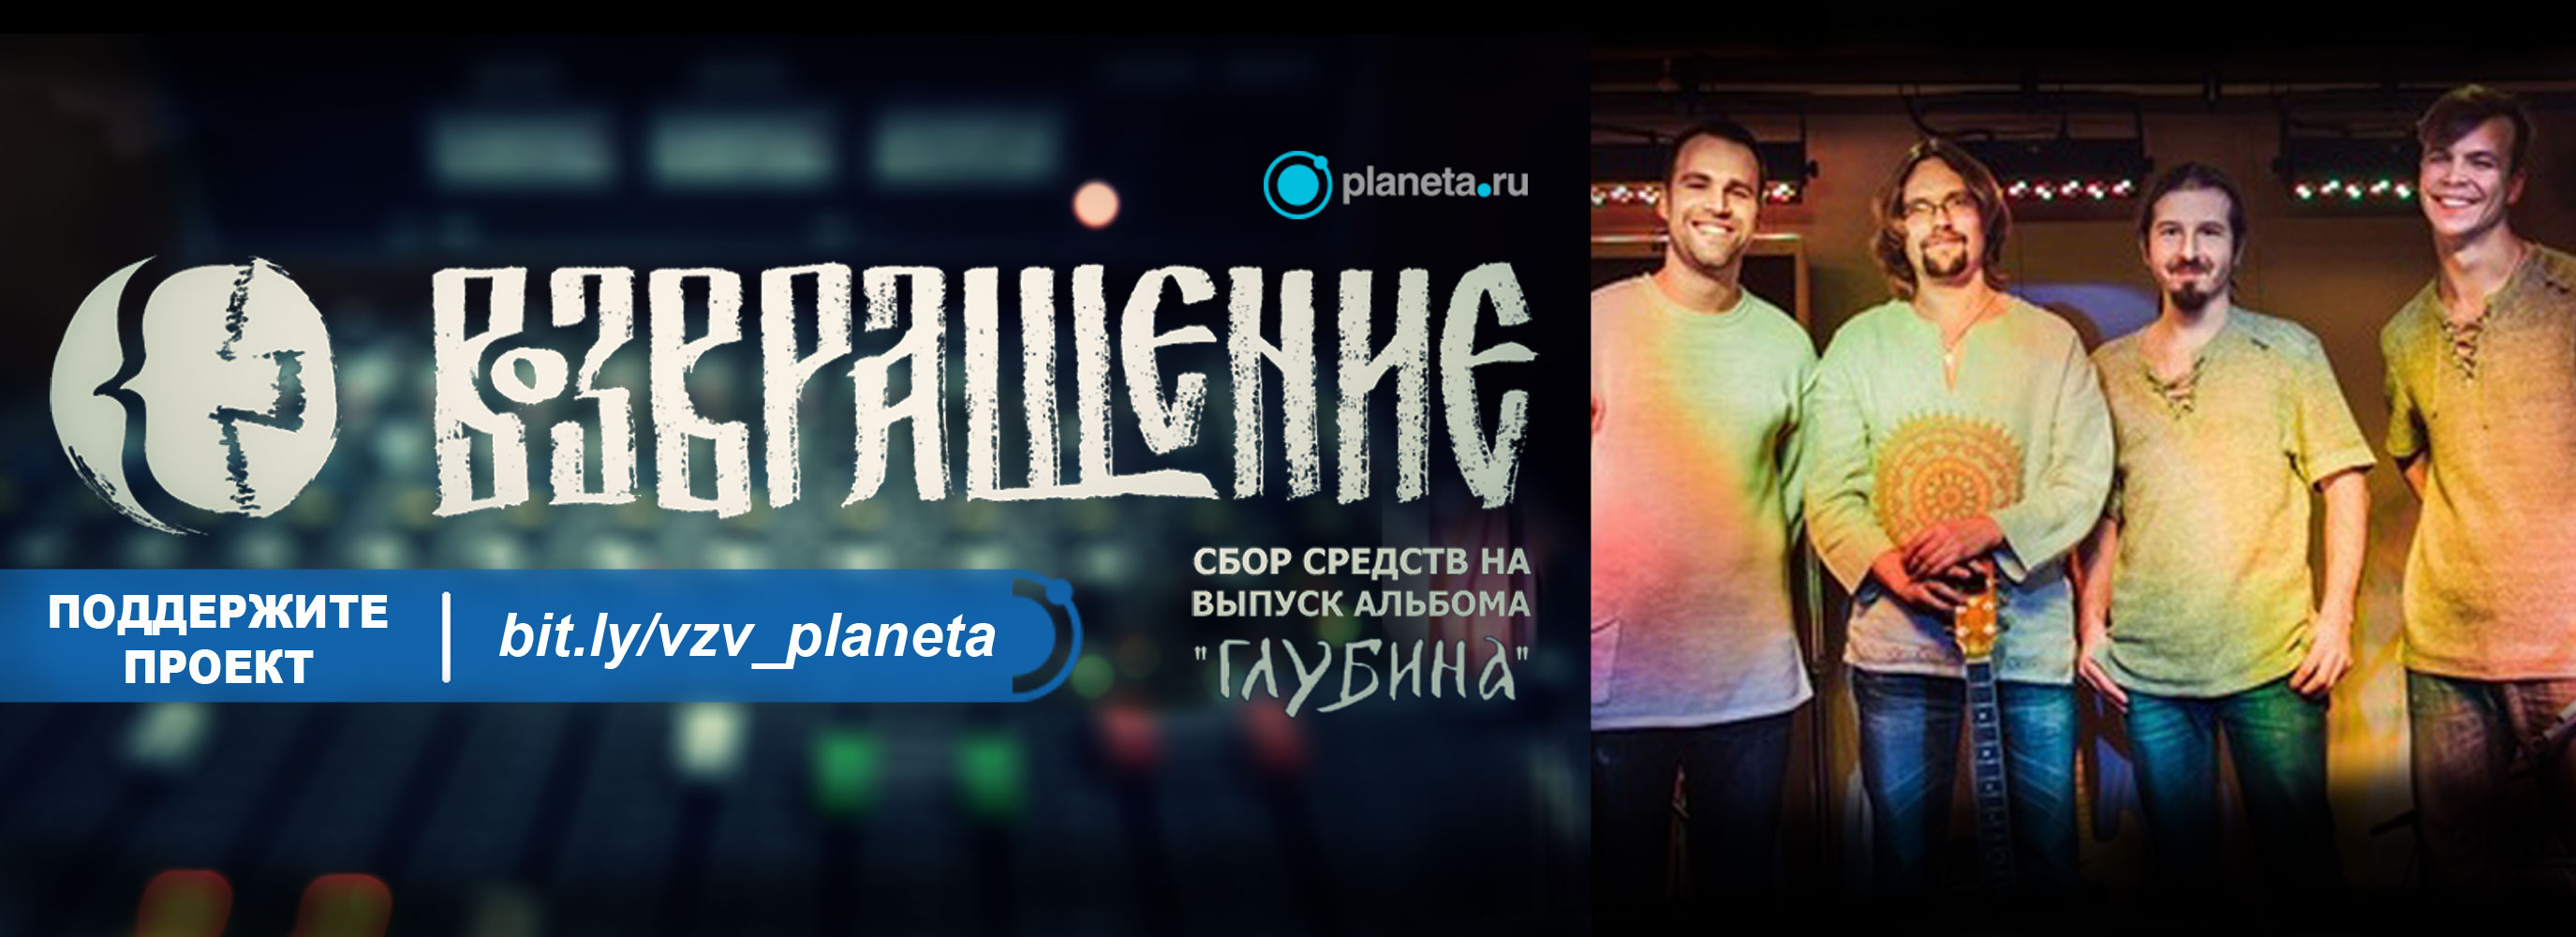 <div style='text-align:right'>Новый альбом &quot;Глубина&quot;</div>